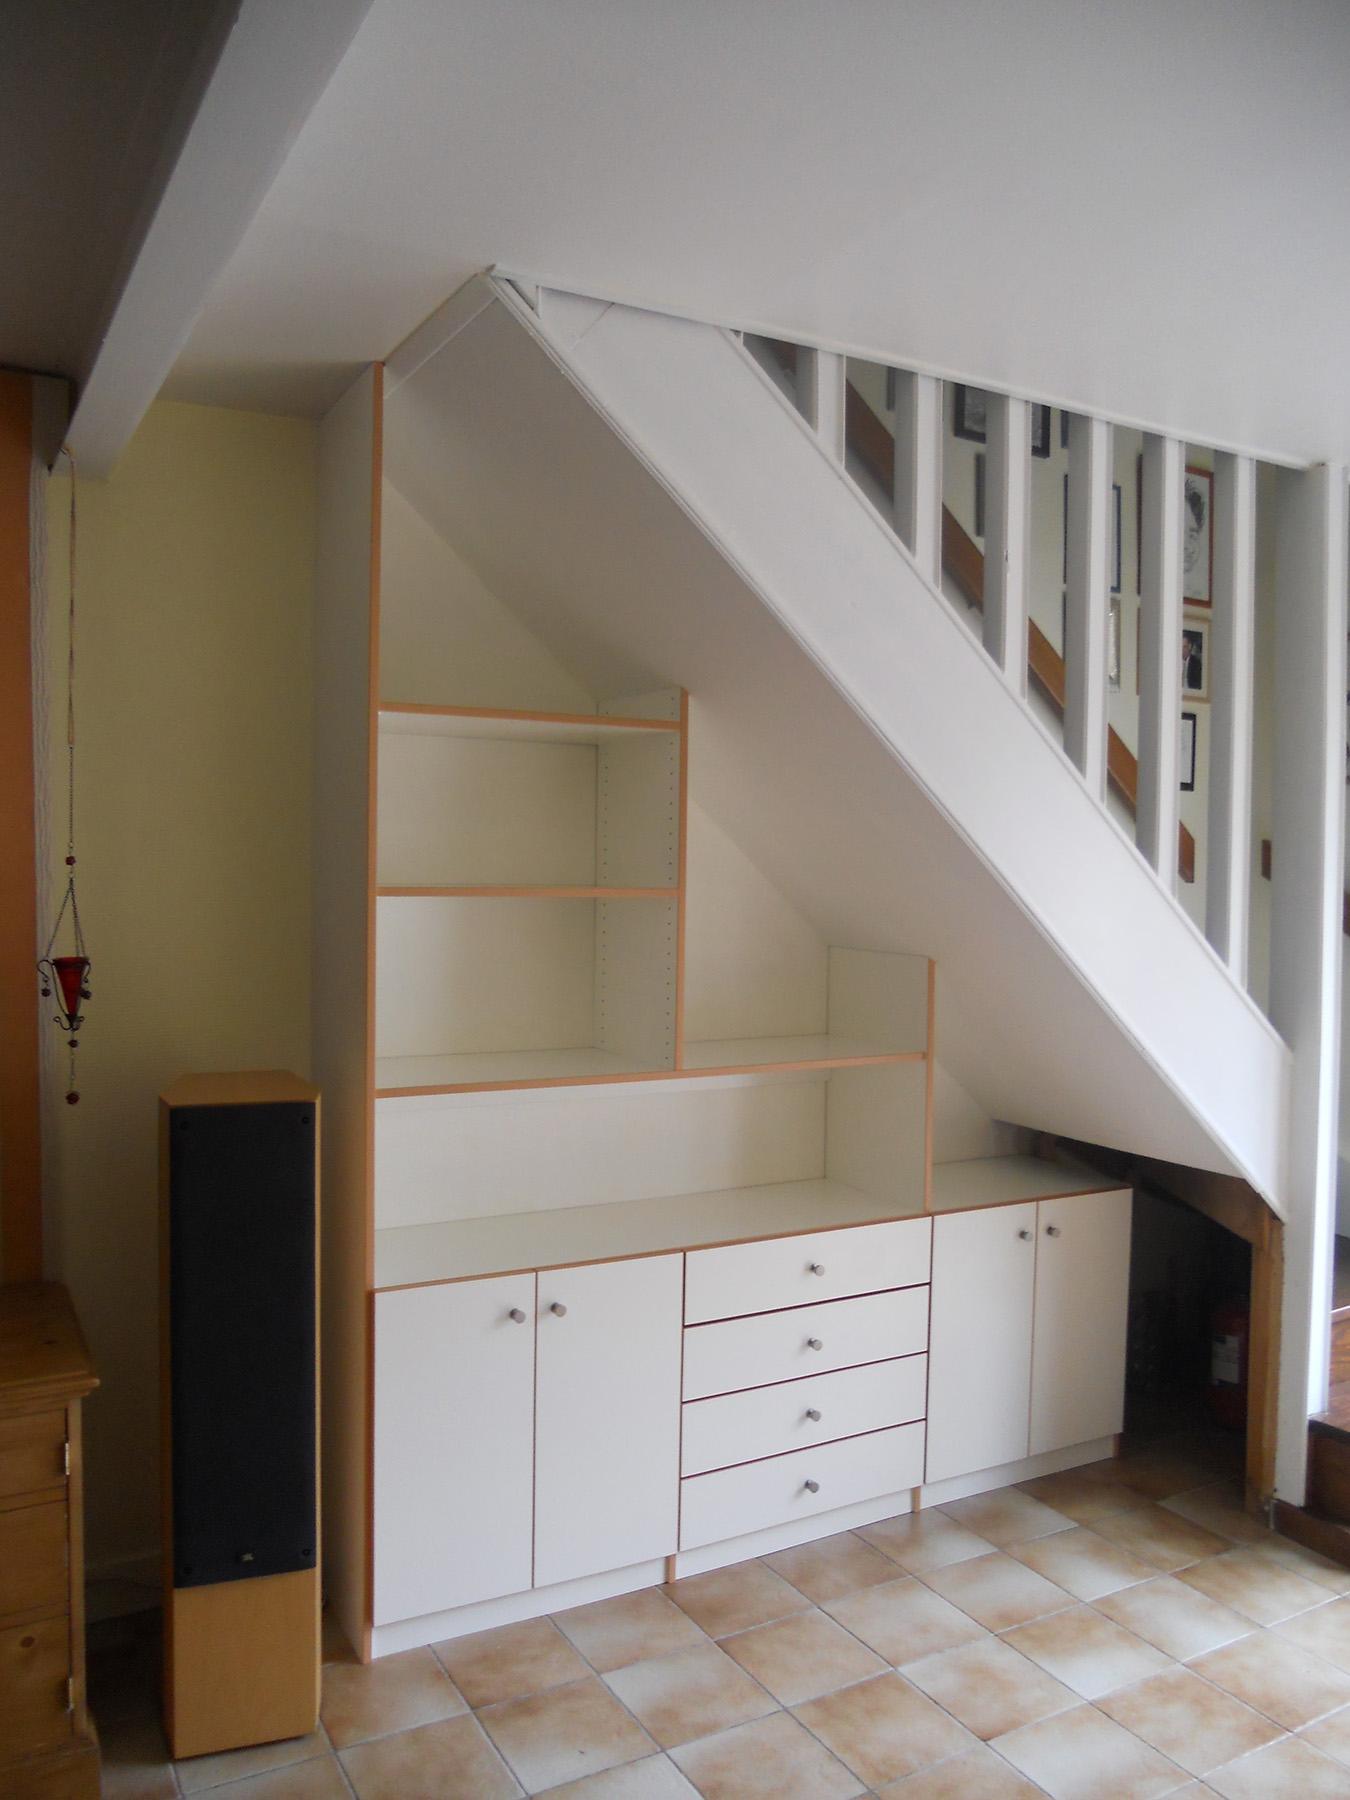 espaceplacard-sous-pente-sous-escalier